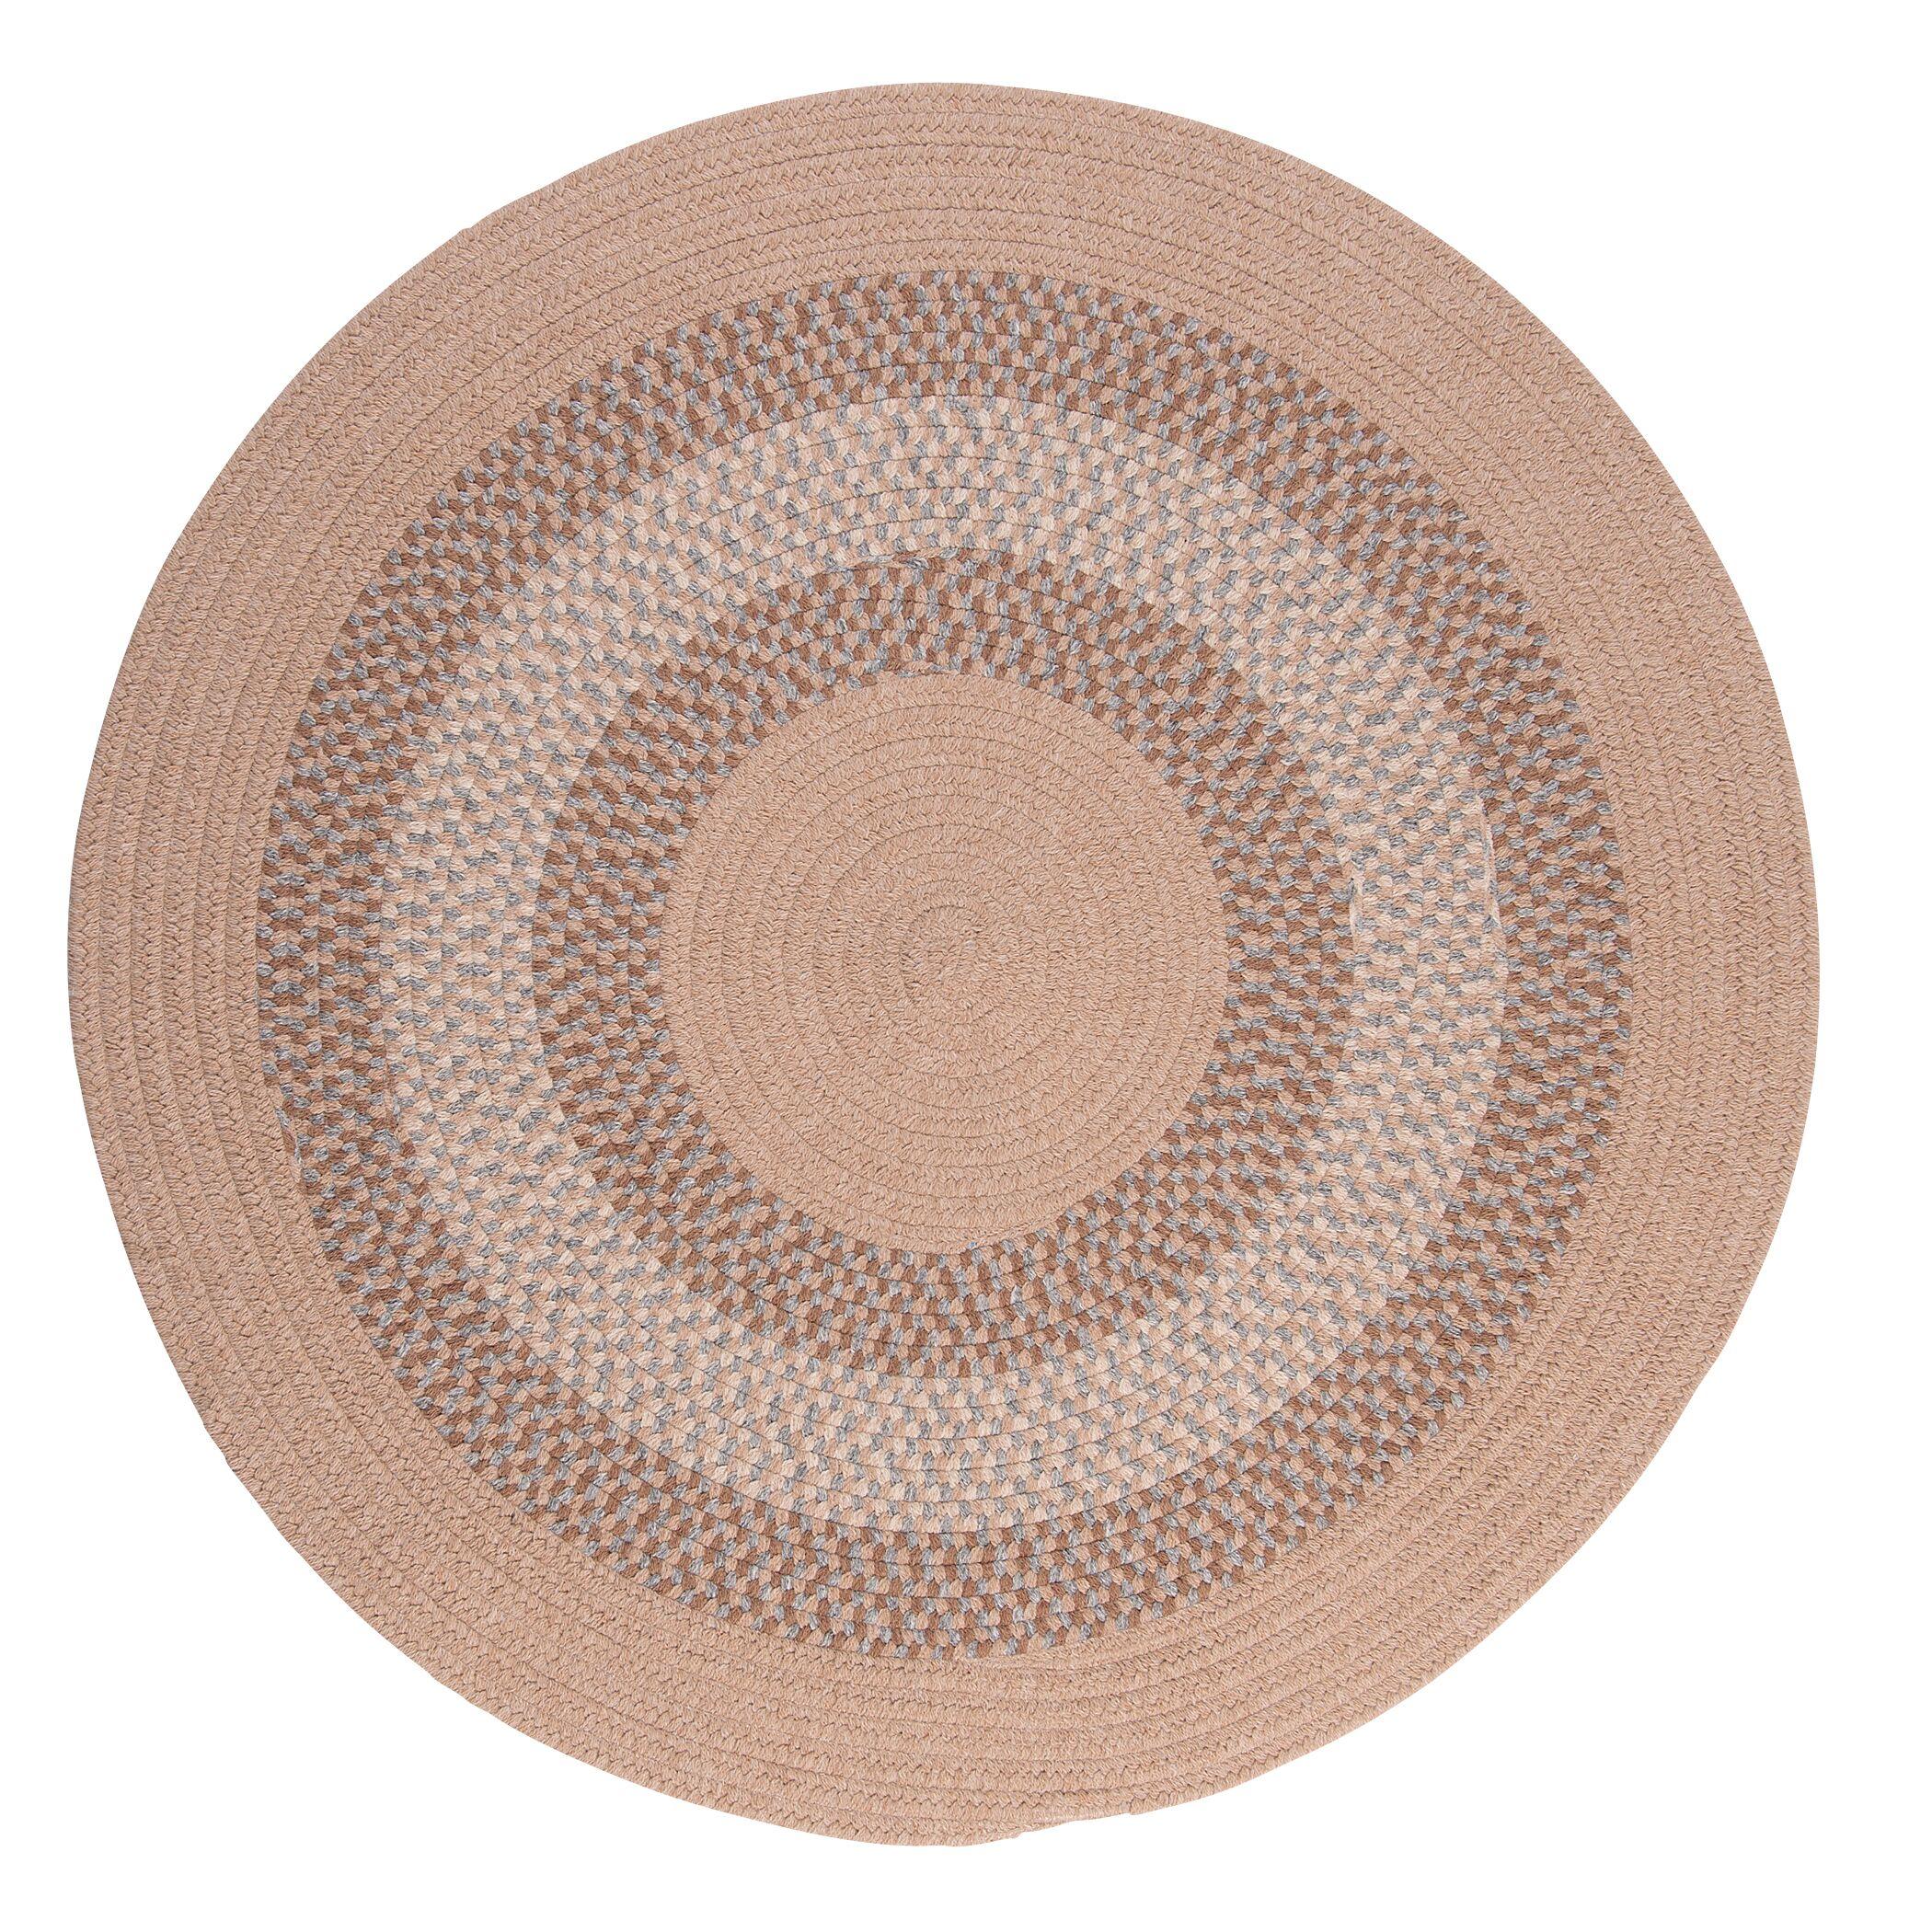 Serafin Oatmeal Area Rug Rug Size: Round 12'